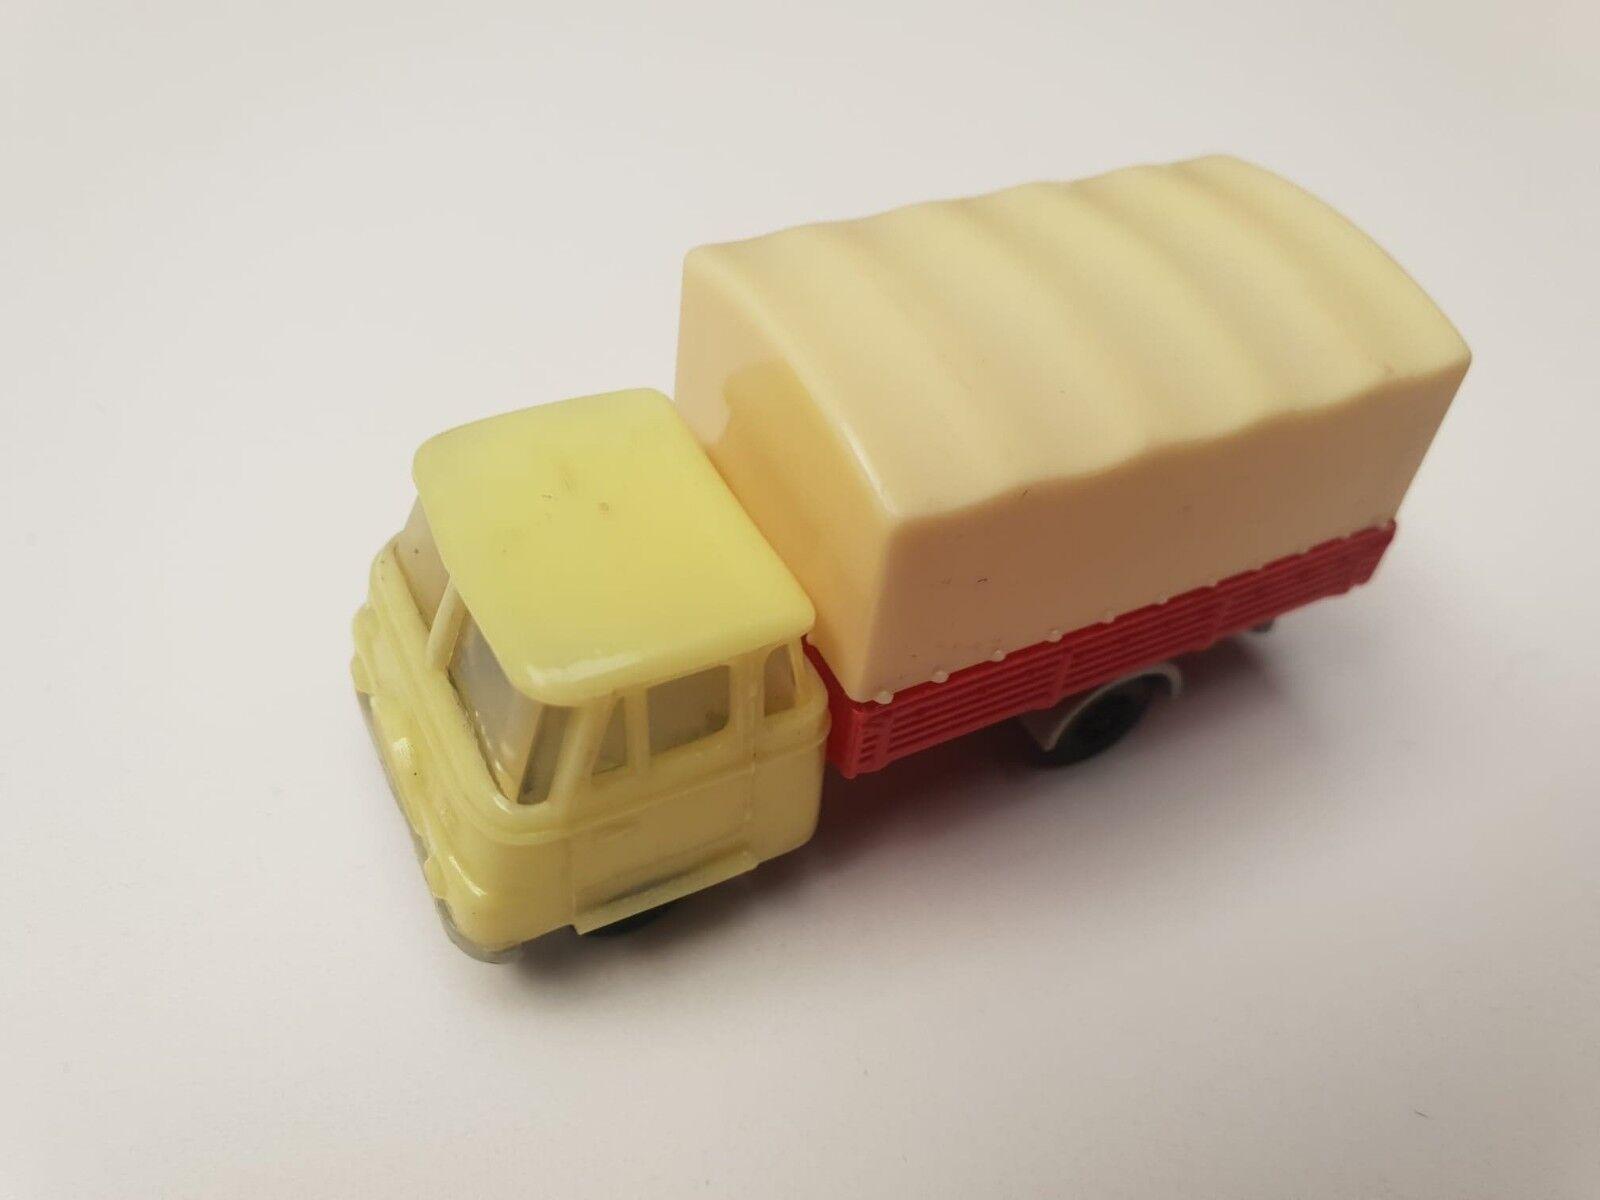 Vintage PL 1 87 RUCH Robur L2500 pritsche plane 1970 plastic amarillo rojo PRL